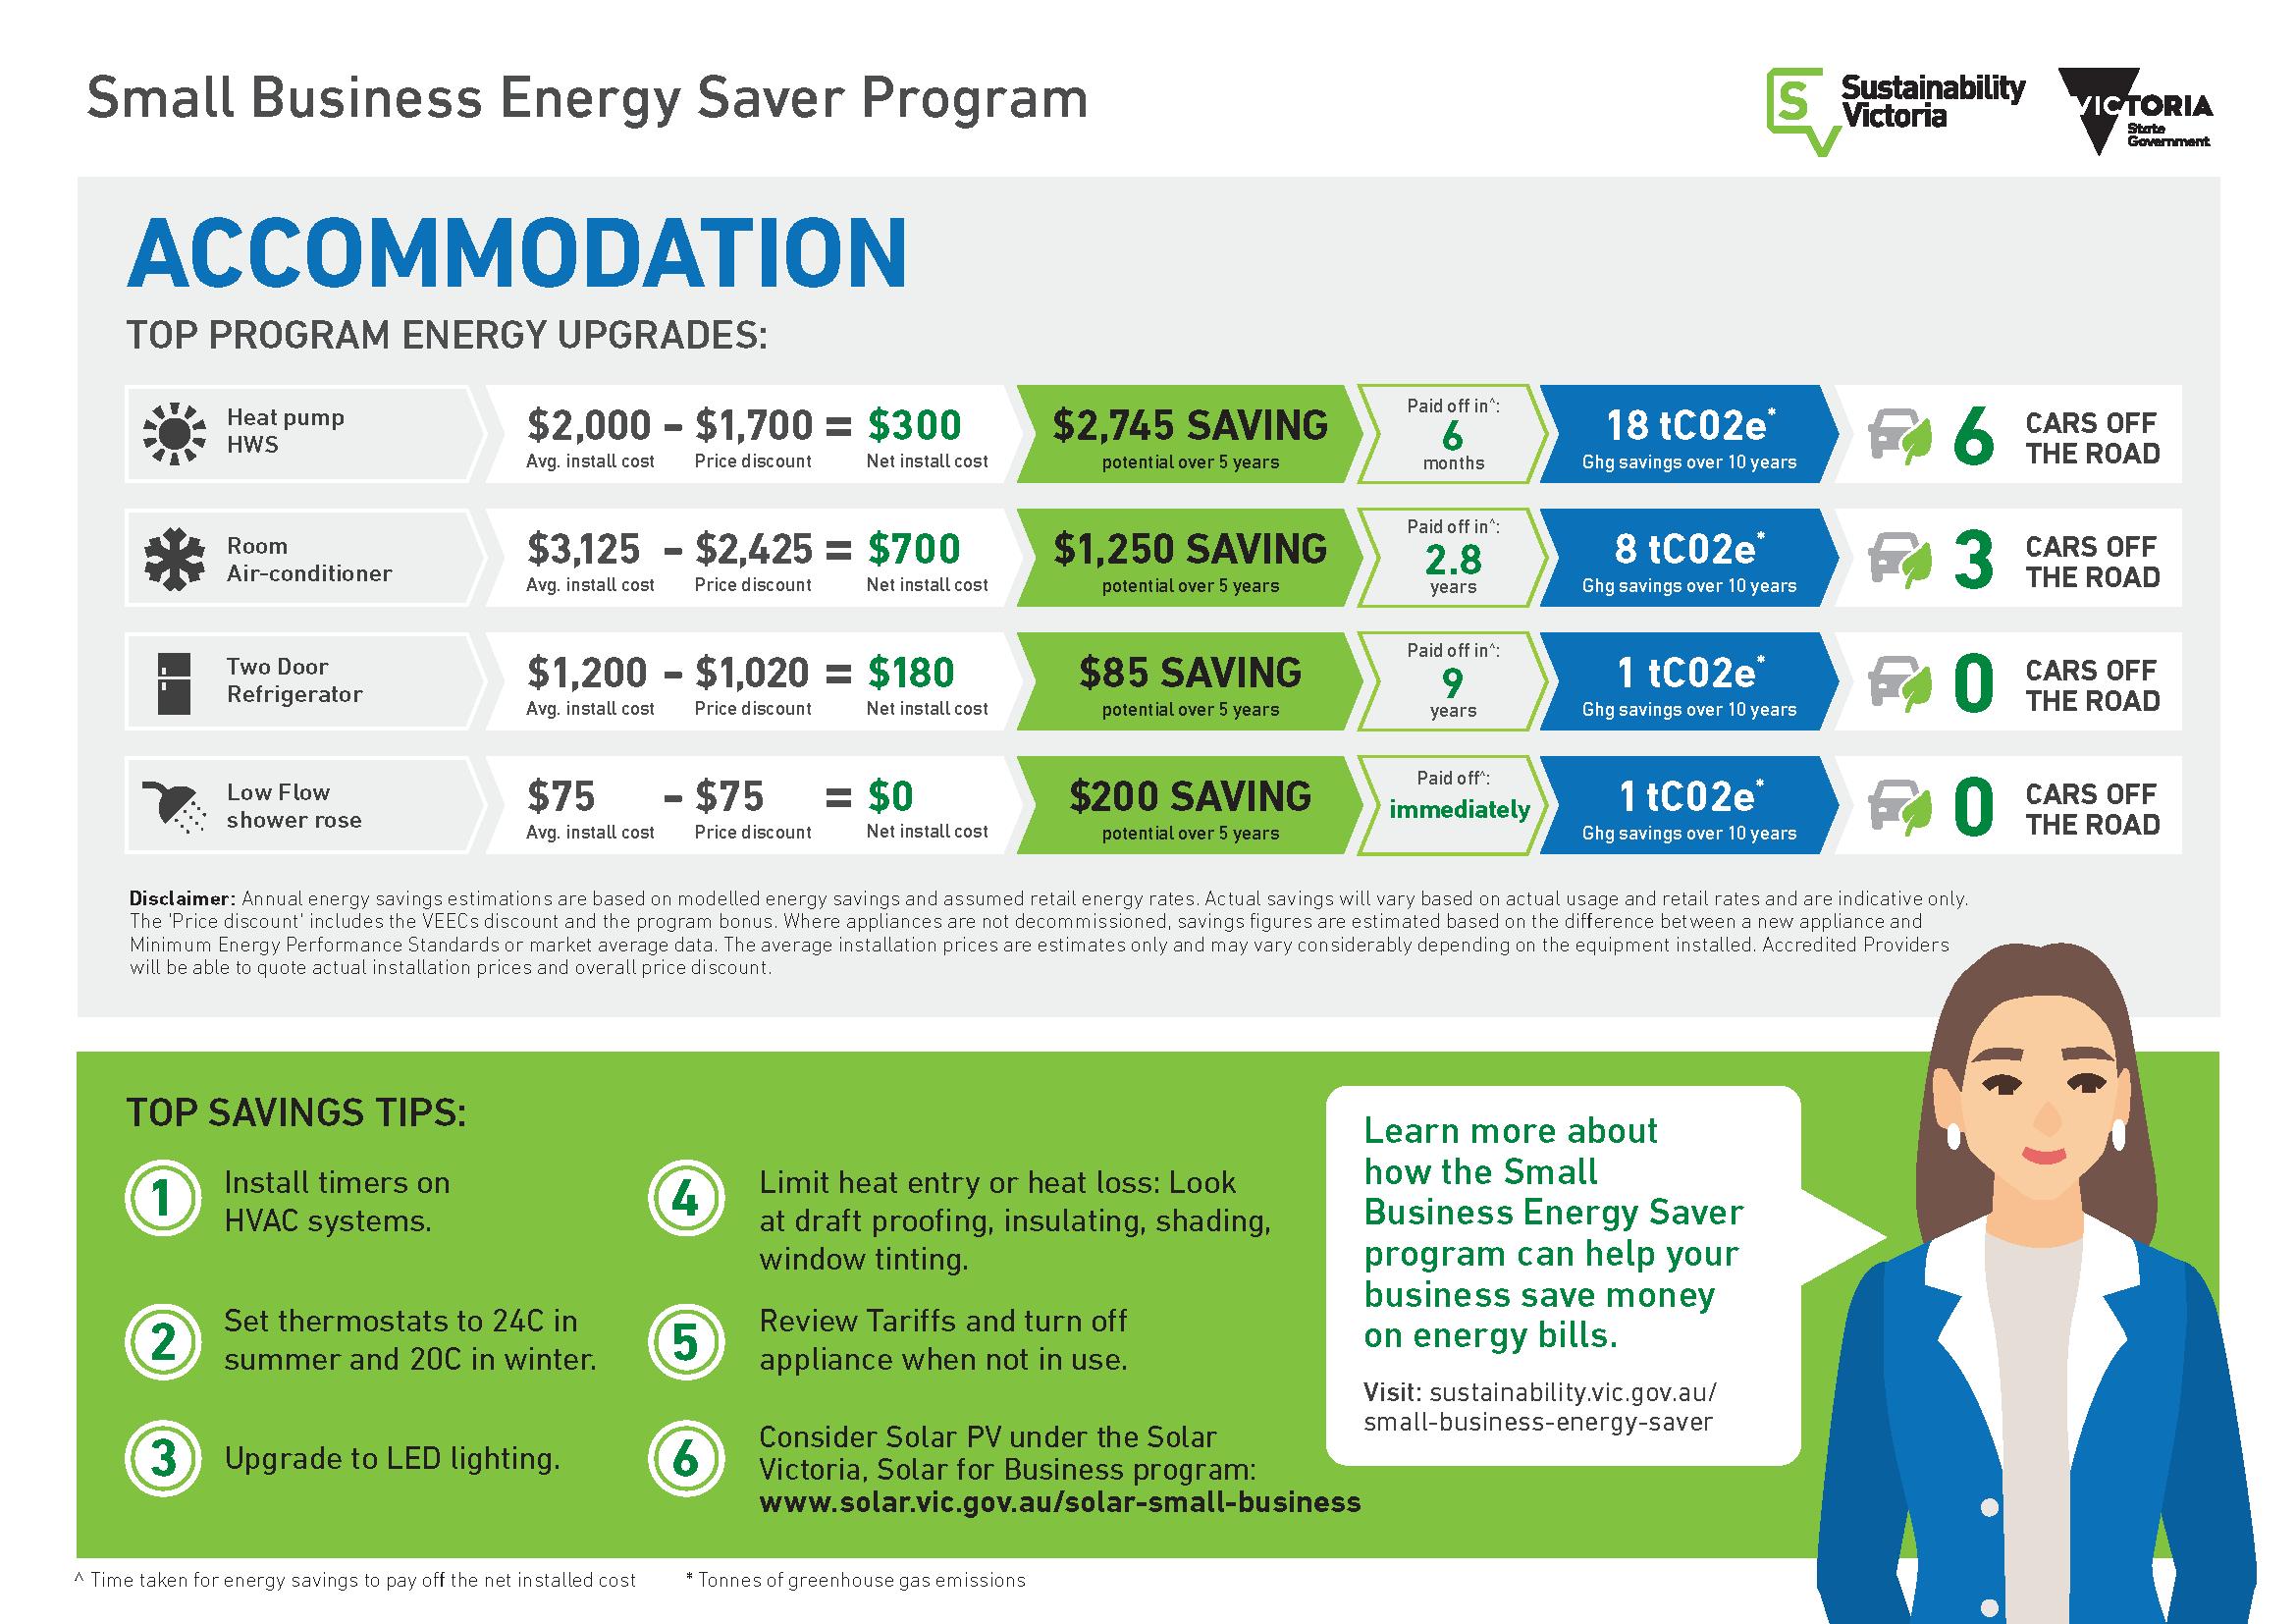 Business Energy Saver Program - Accommodation